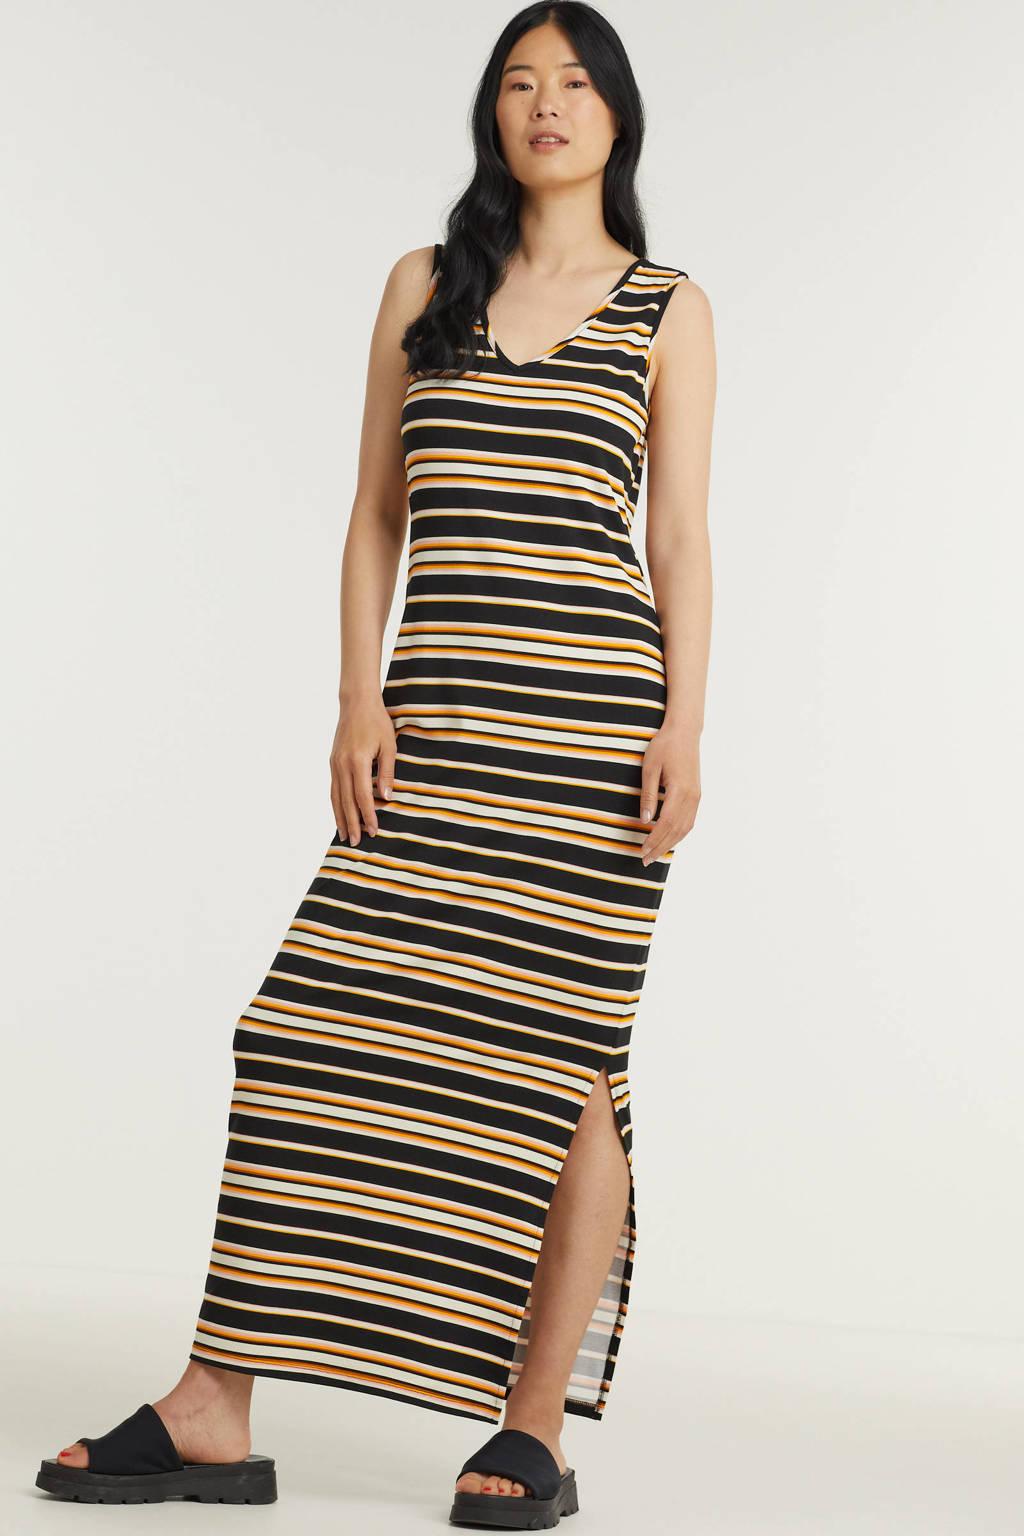 Tramontana gestreepte maxi jurk zwart/geel, Zwart/geel